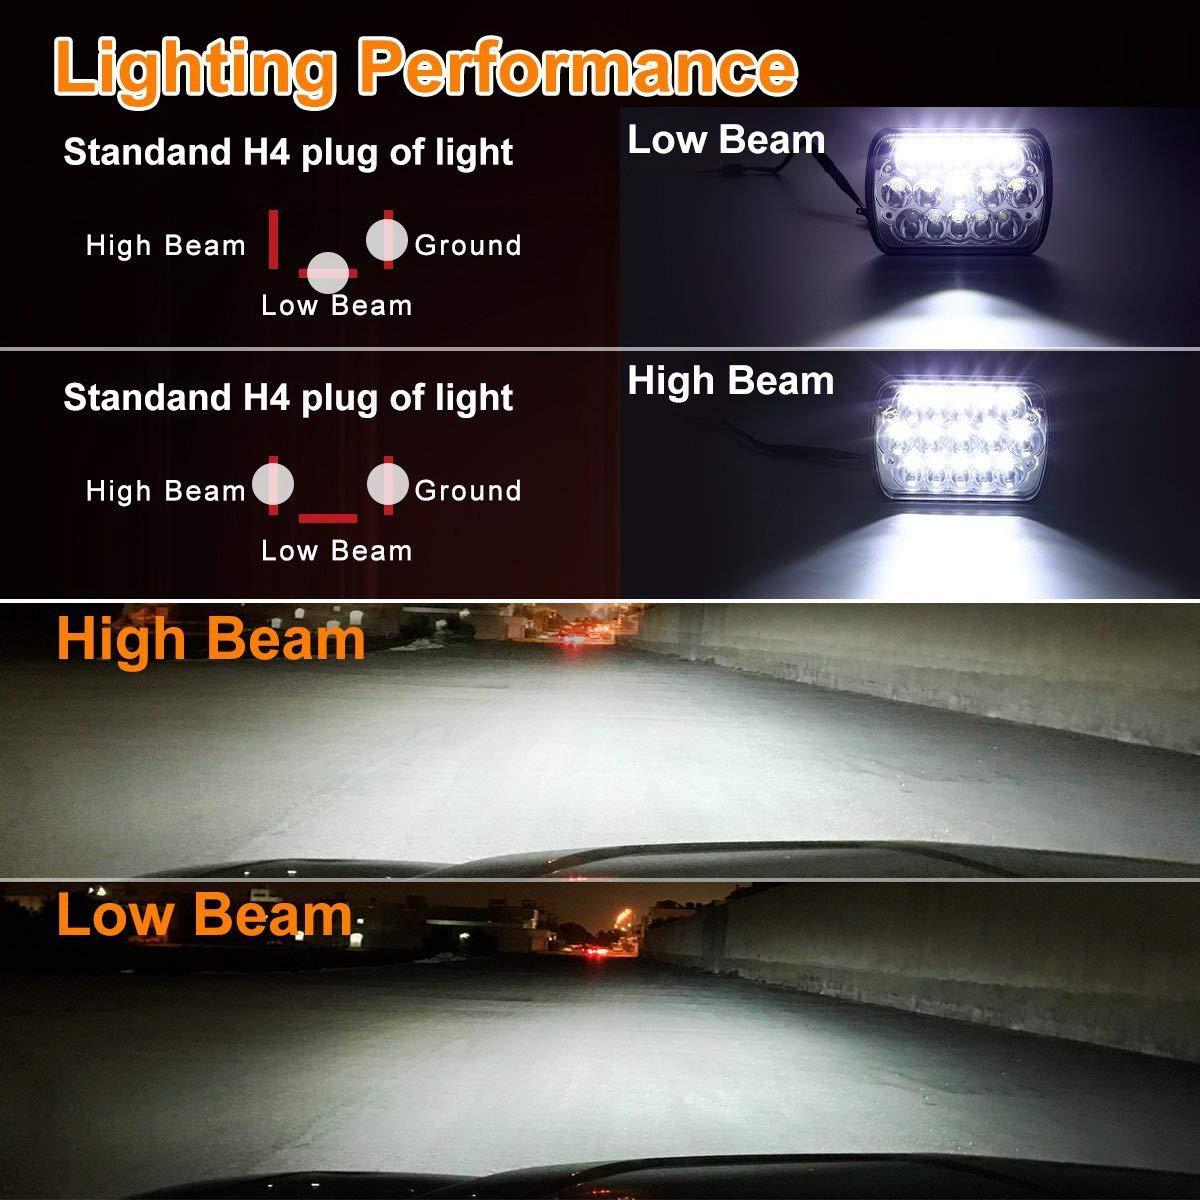 H6054 Led Headlights 2 Yr Warranty Pair 7x6 Dual Battery Wiring Diagram 86 Gmc C3500 5x7 Headlight 6054 Hi Low